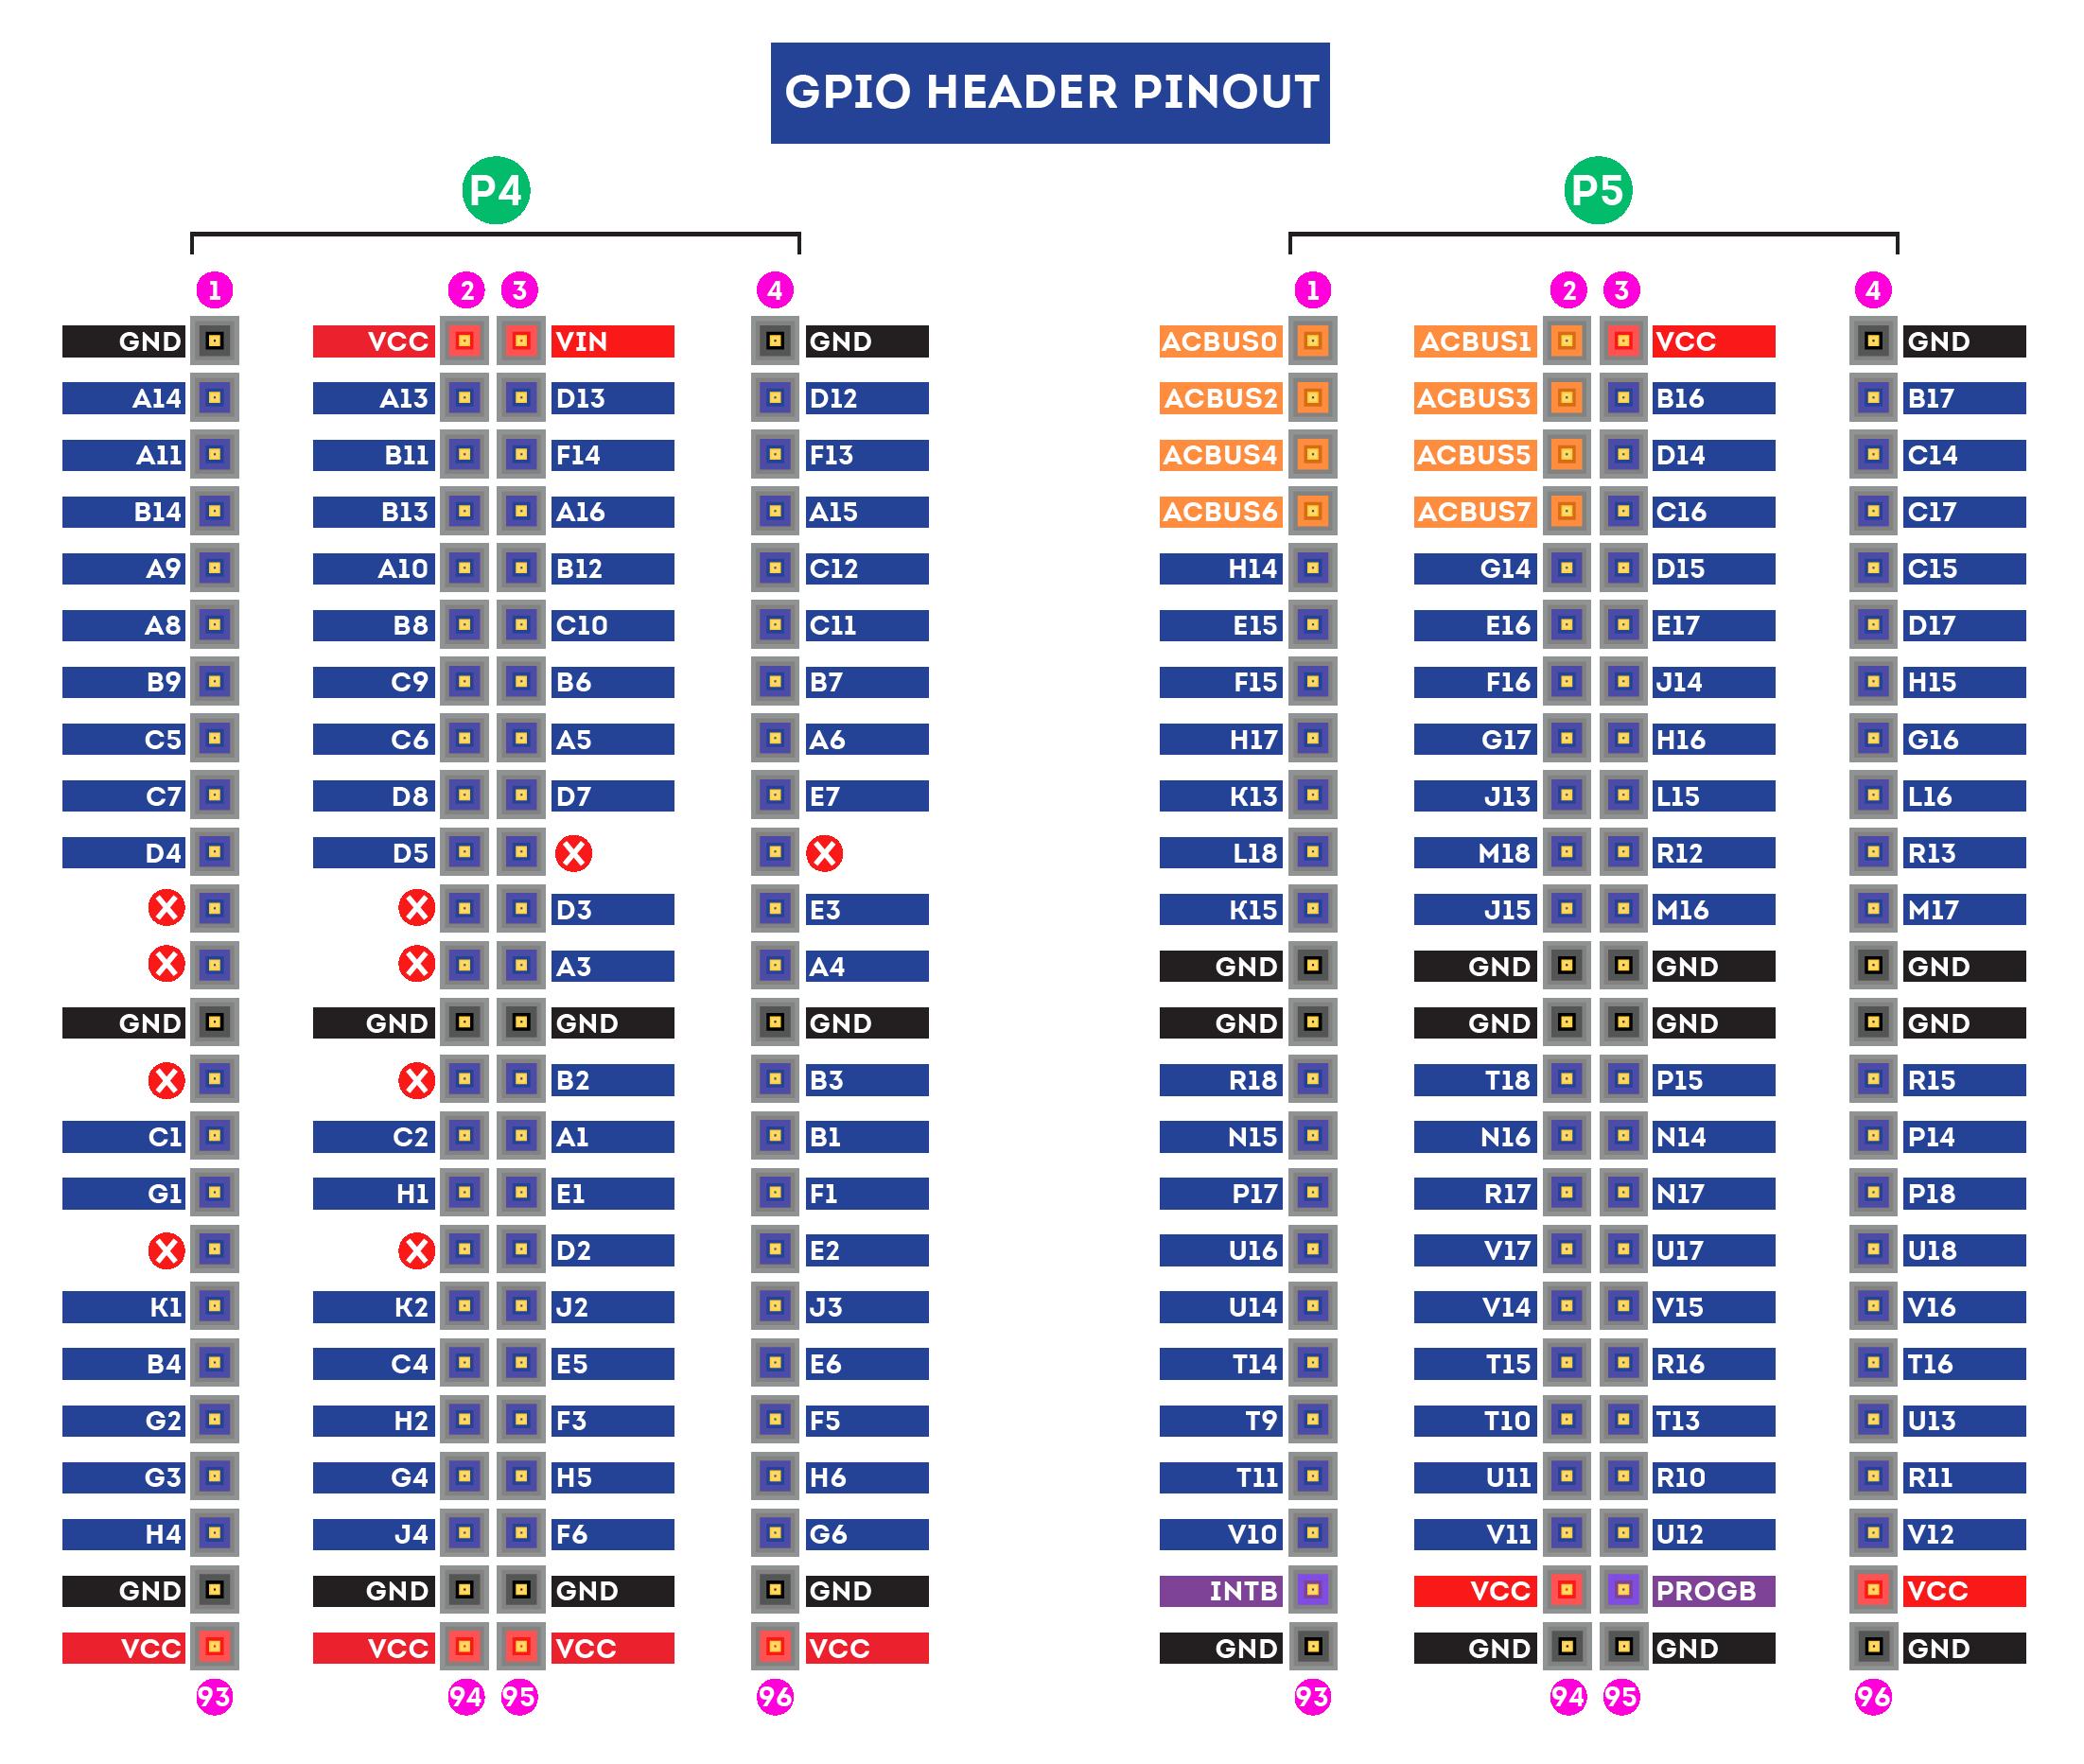 Neso Artix-7 FPGA - Header pinout diagram